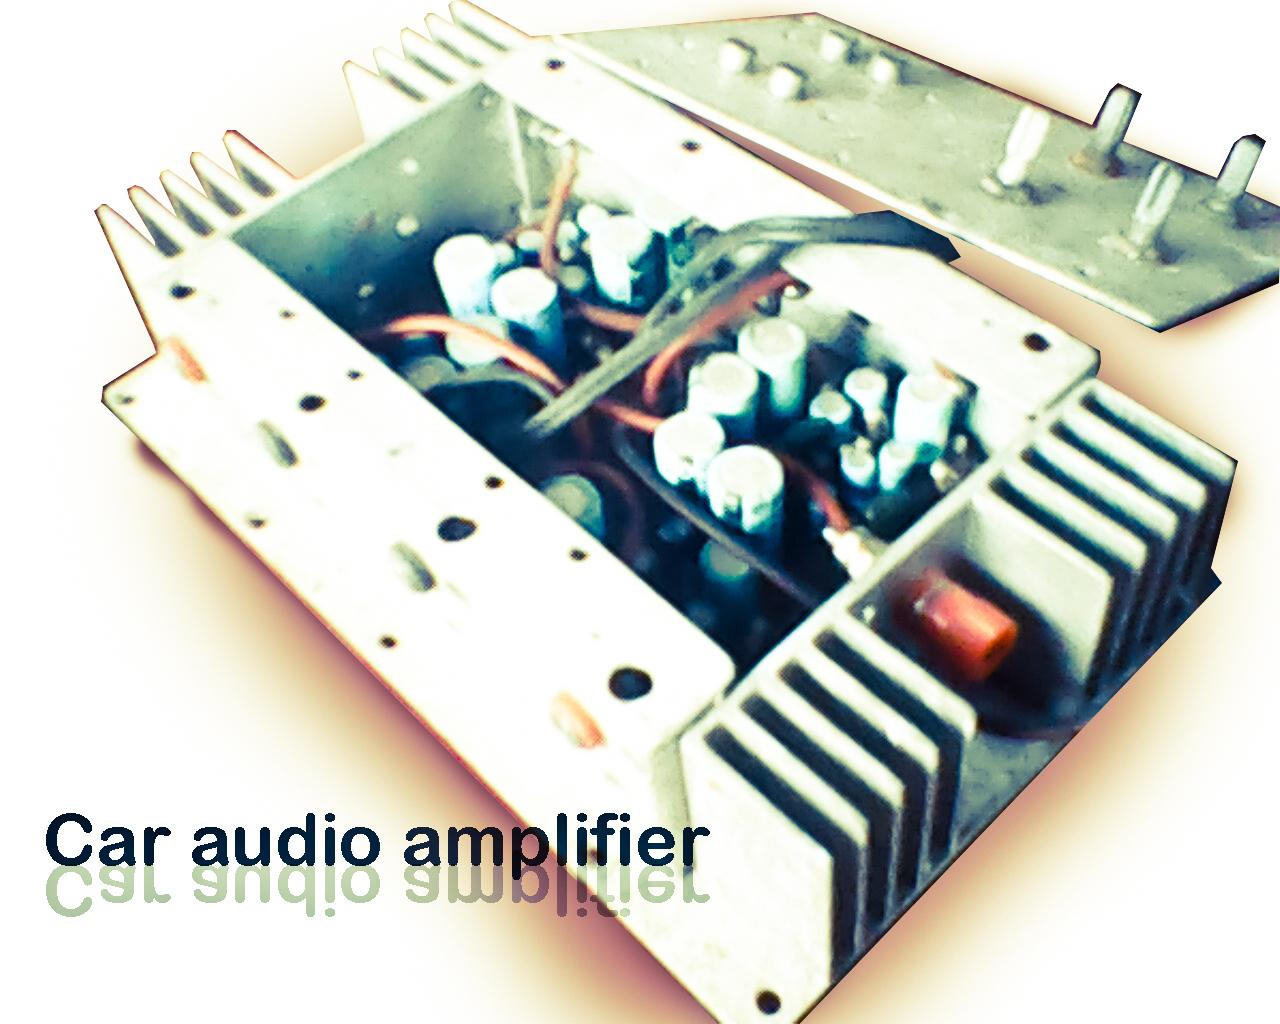 High Power Car Audio Amplifier Gambar Skema Rangkaian Elektronika 1w Stereo Headphone Based Tda2822